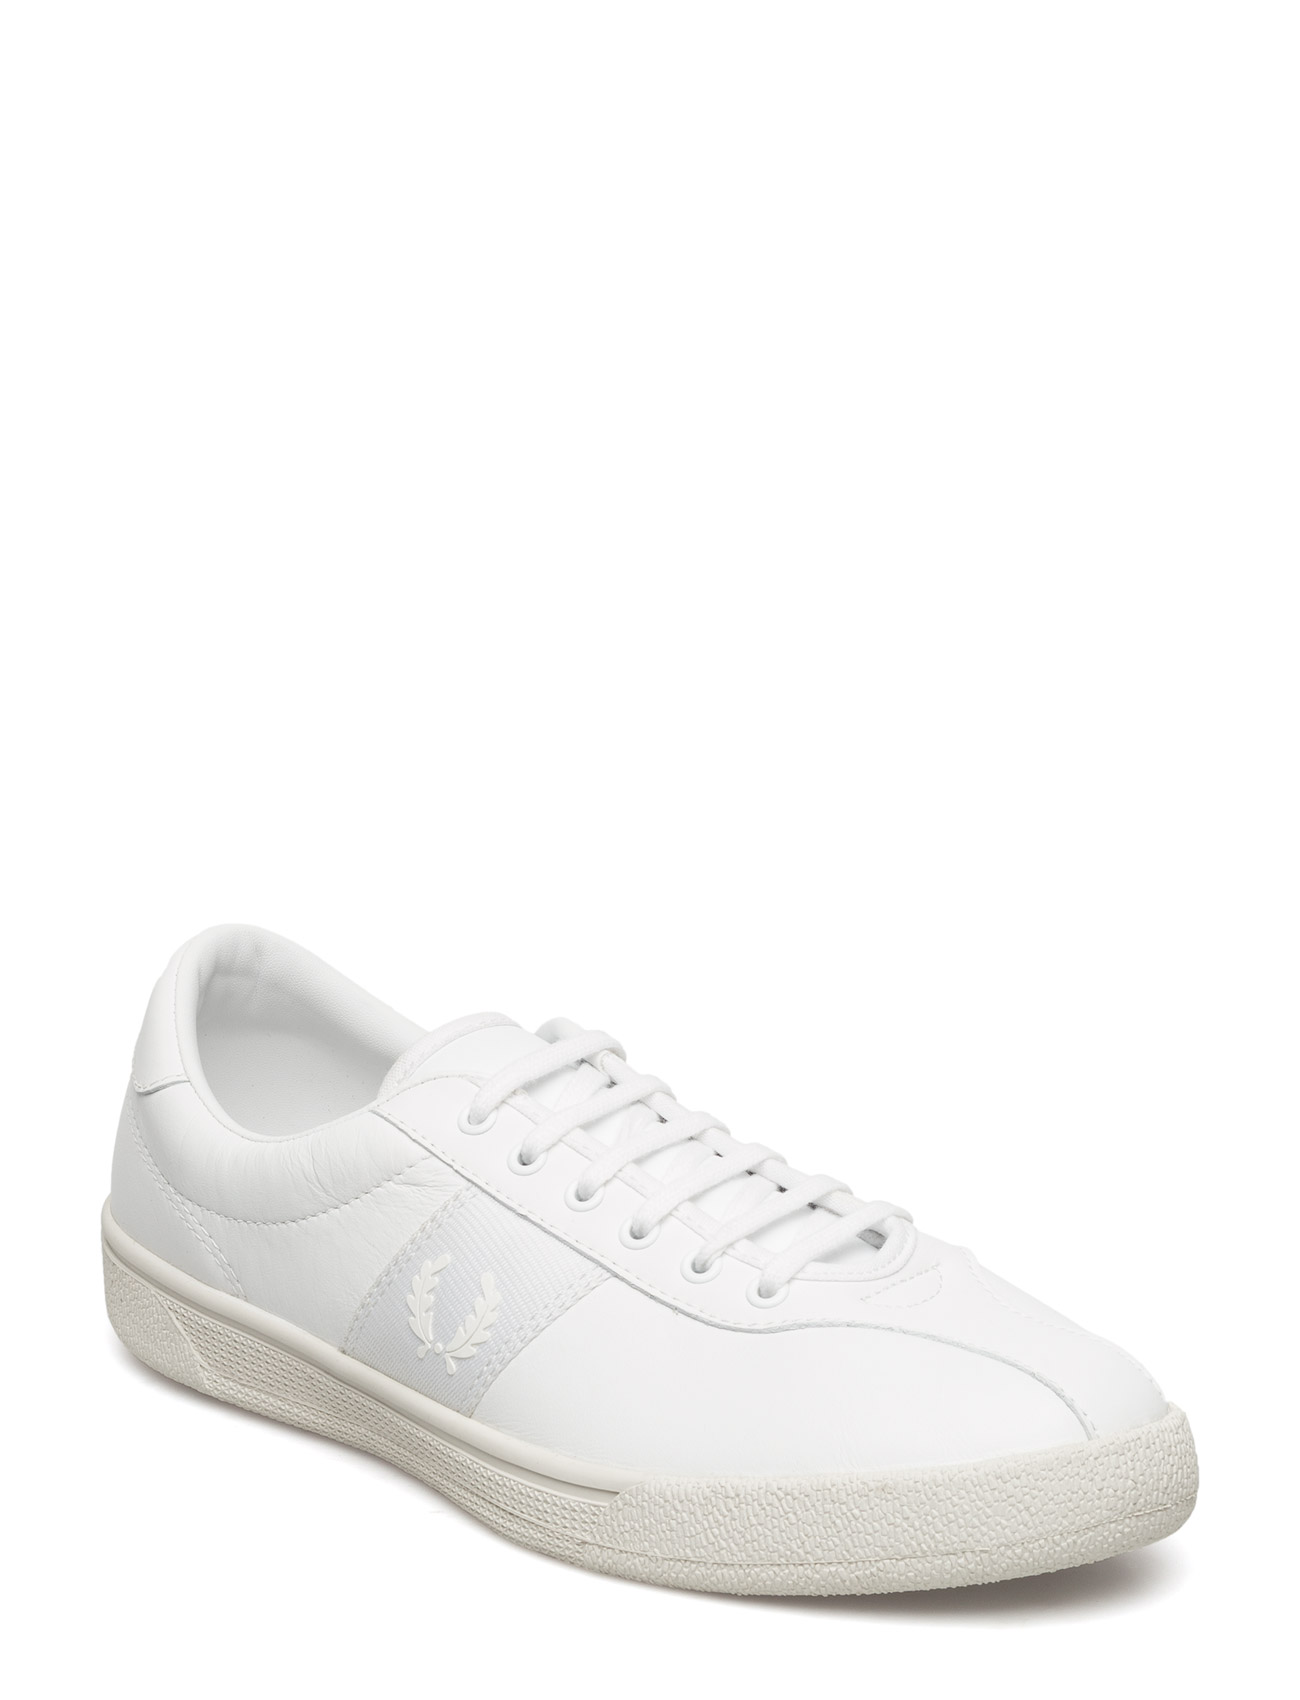 B103 Fred Perry Sneakers til Herrer i Sne hvid